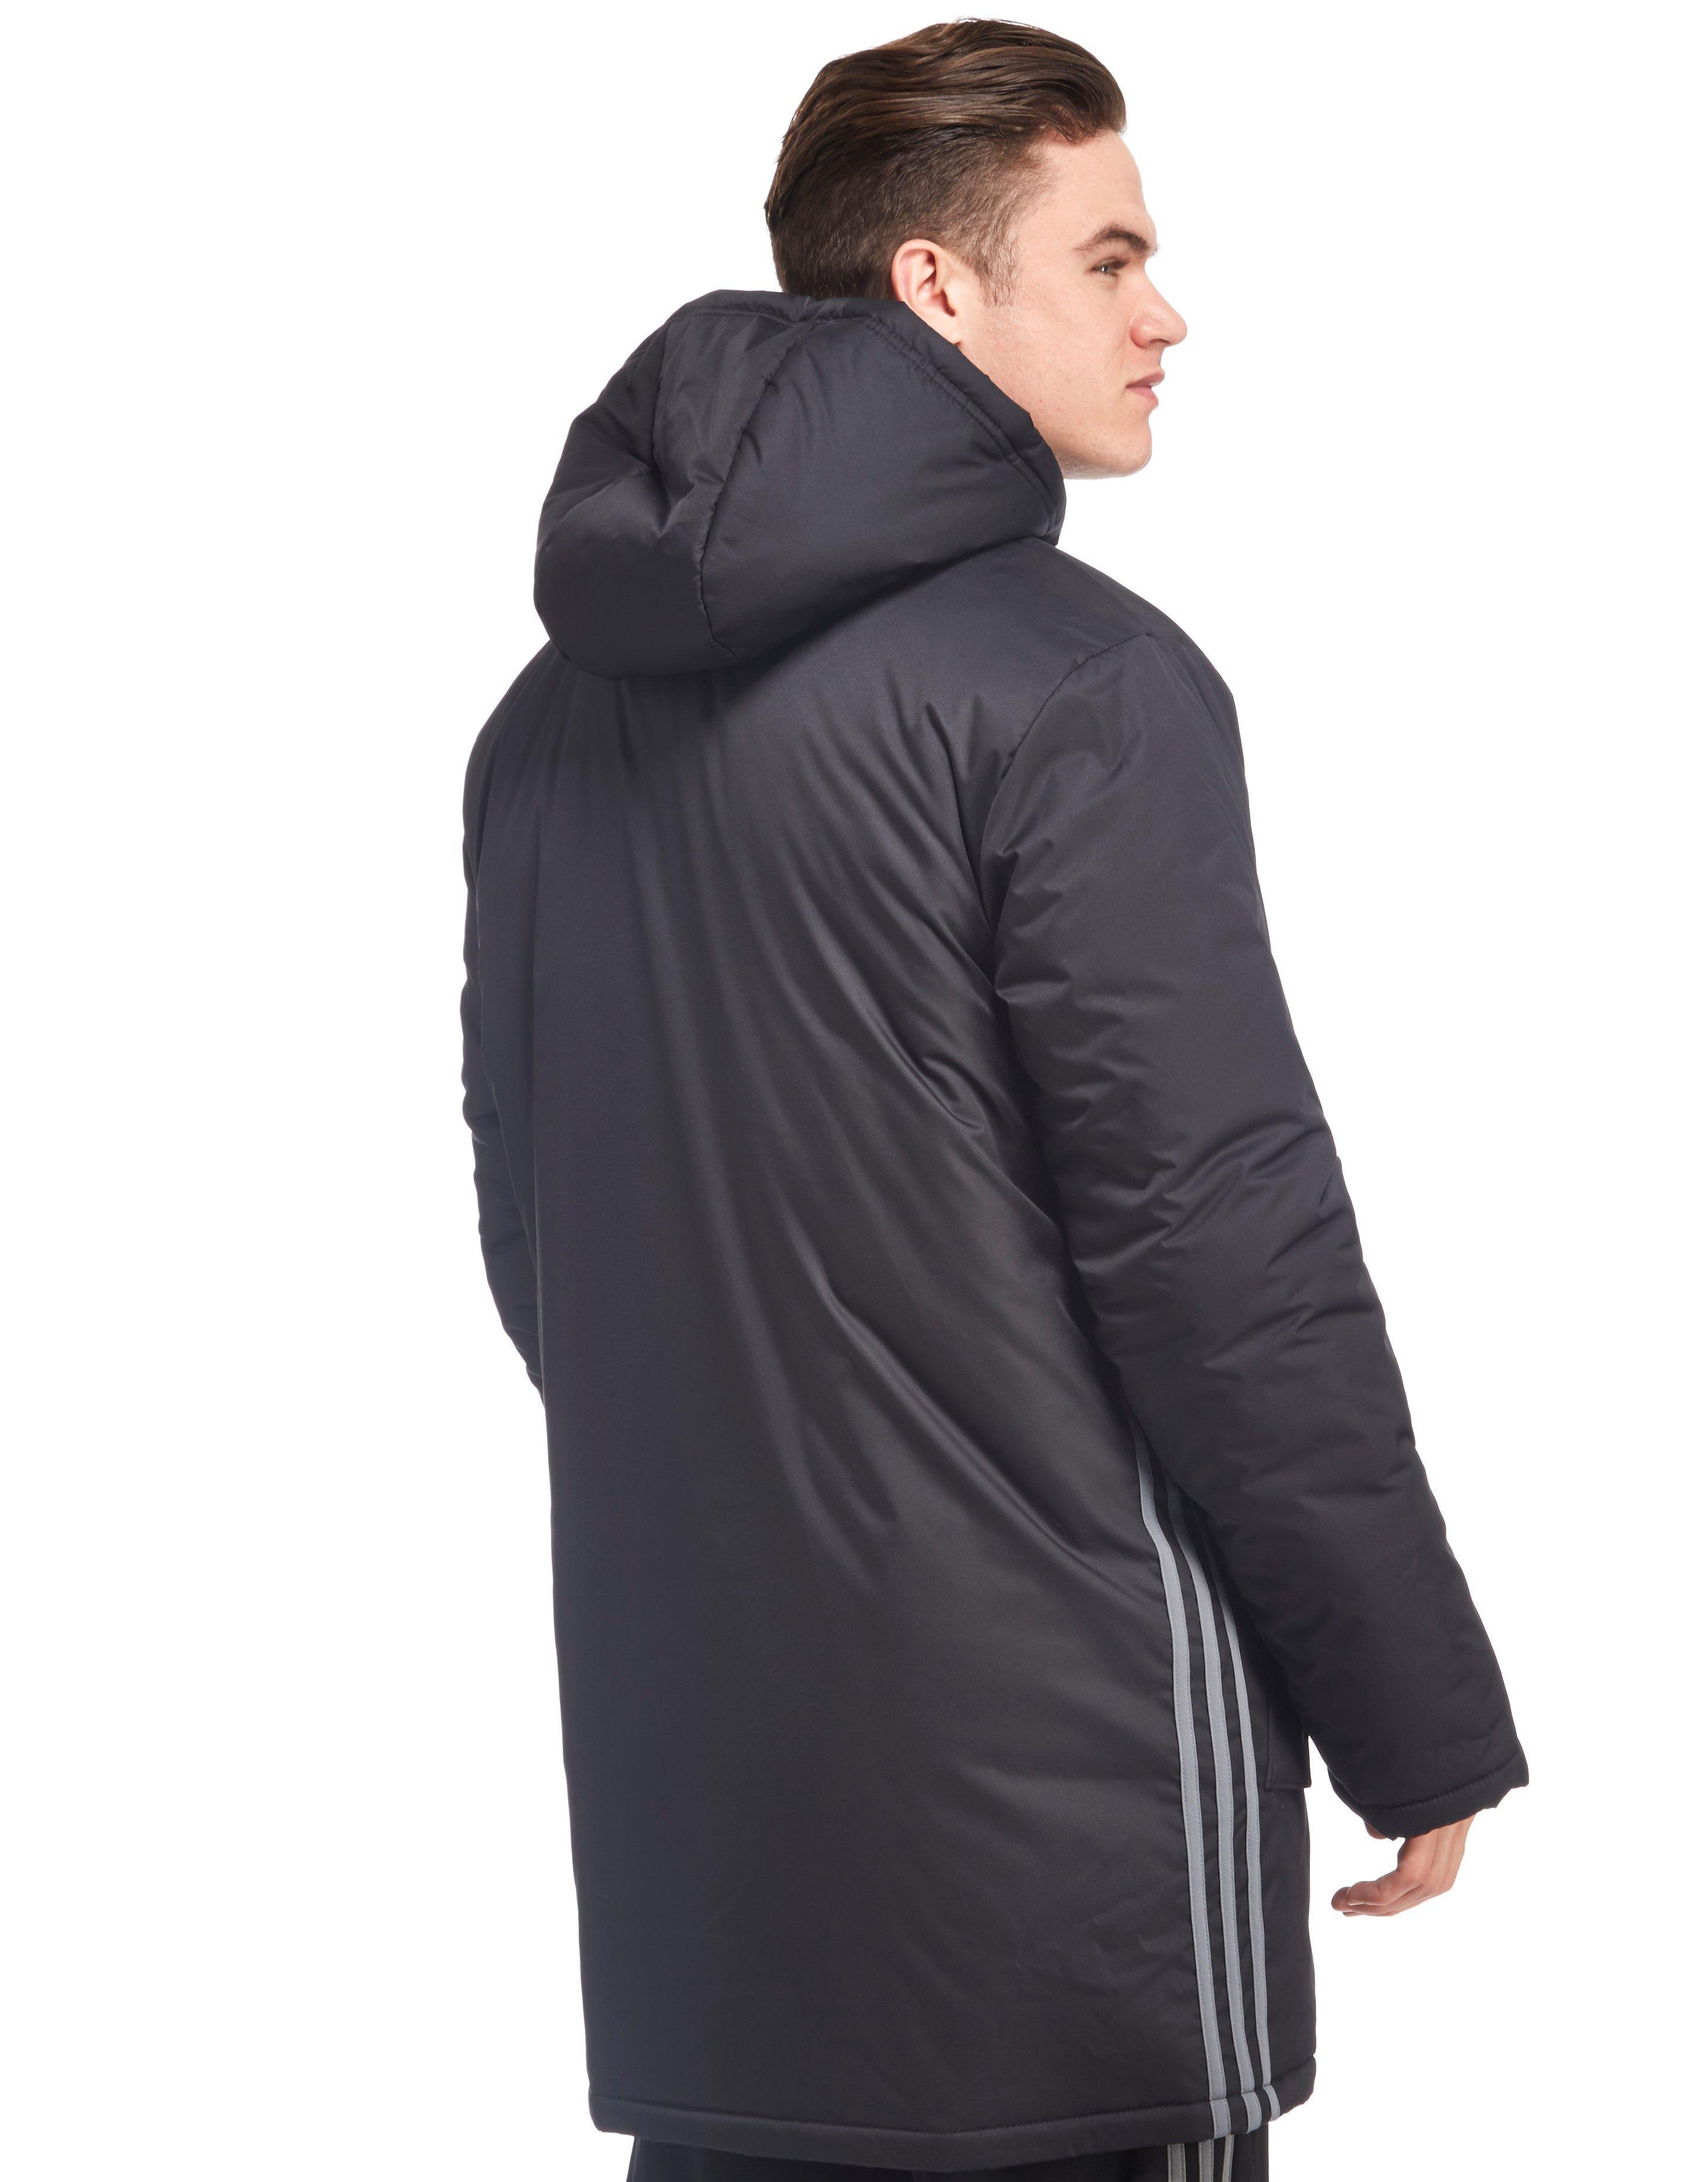 5be62d762704 adidas Originals Wales 2016 17 Stadium Jacket in Black for Men - Lyst